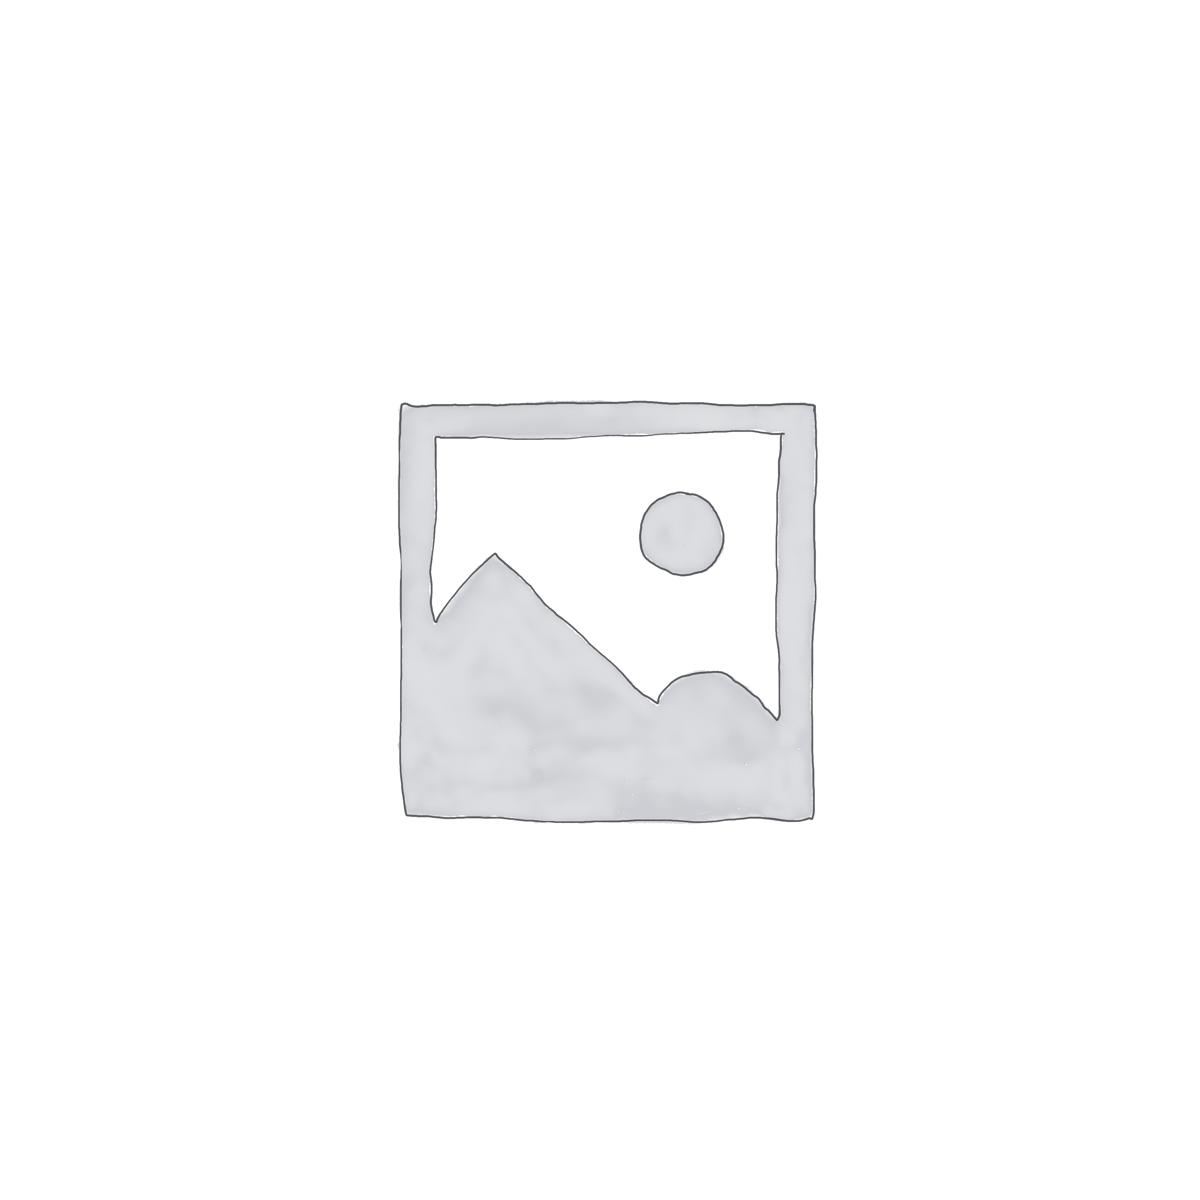 Vintage Floral with Pink Chrysanthemum Wallpaper Mural